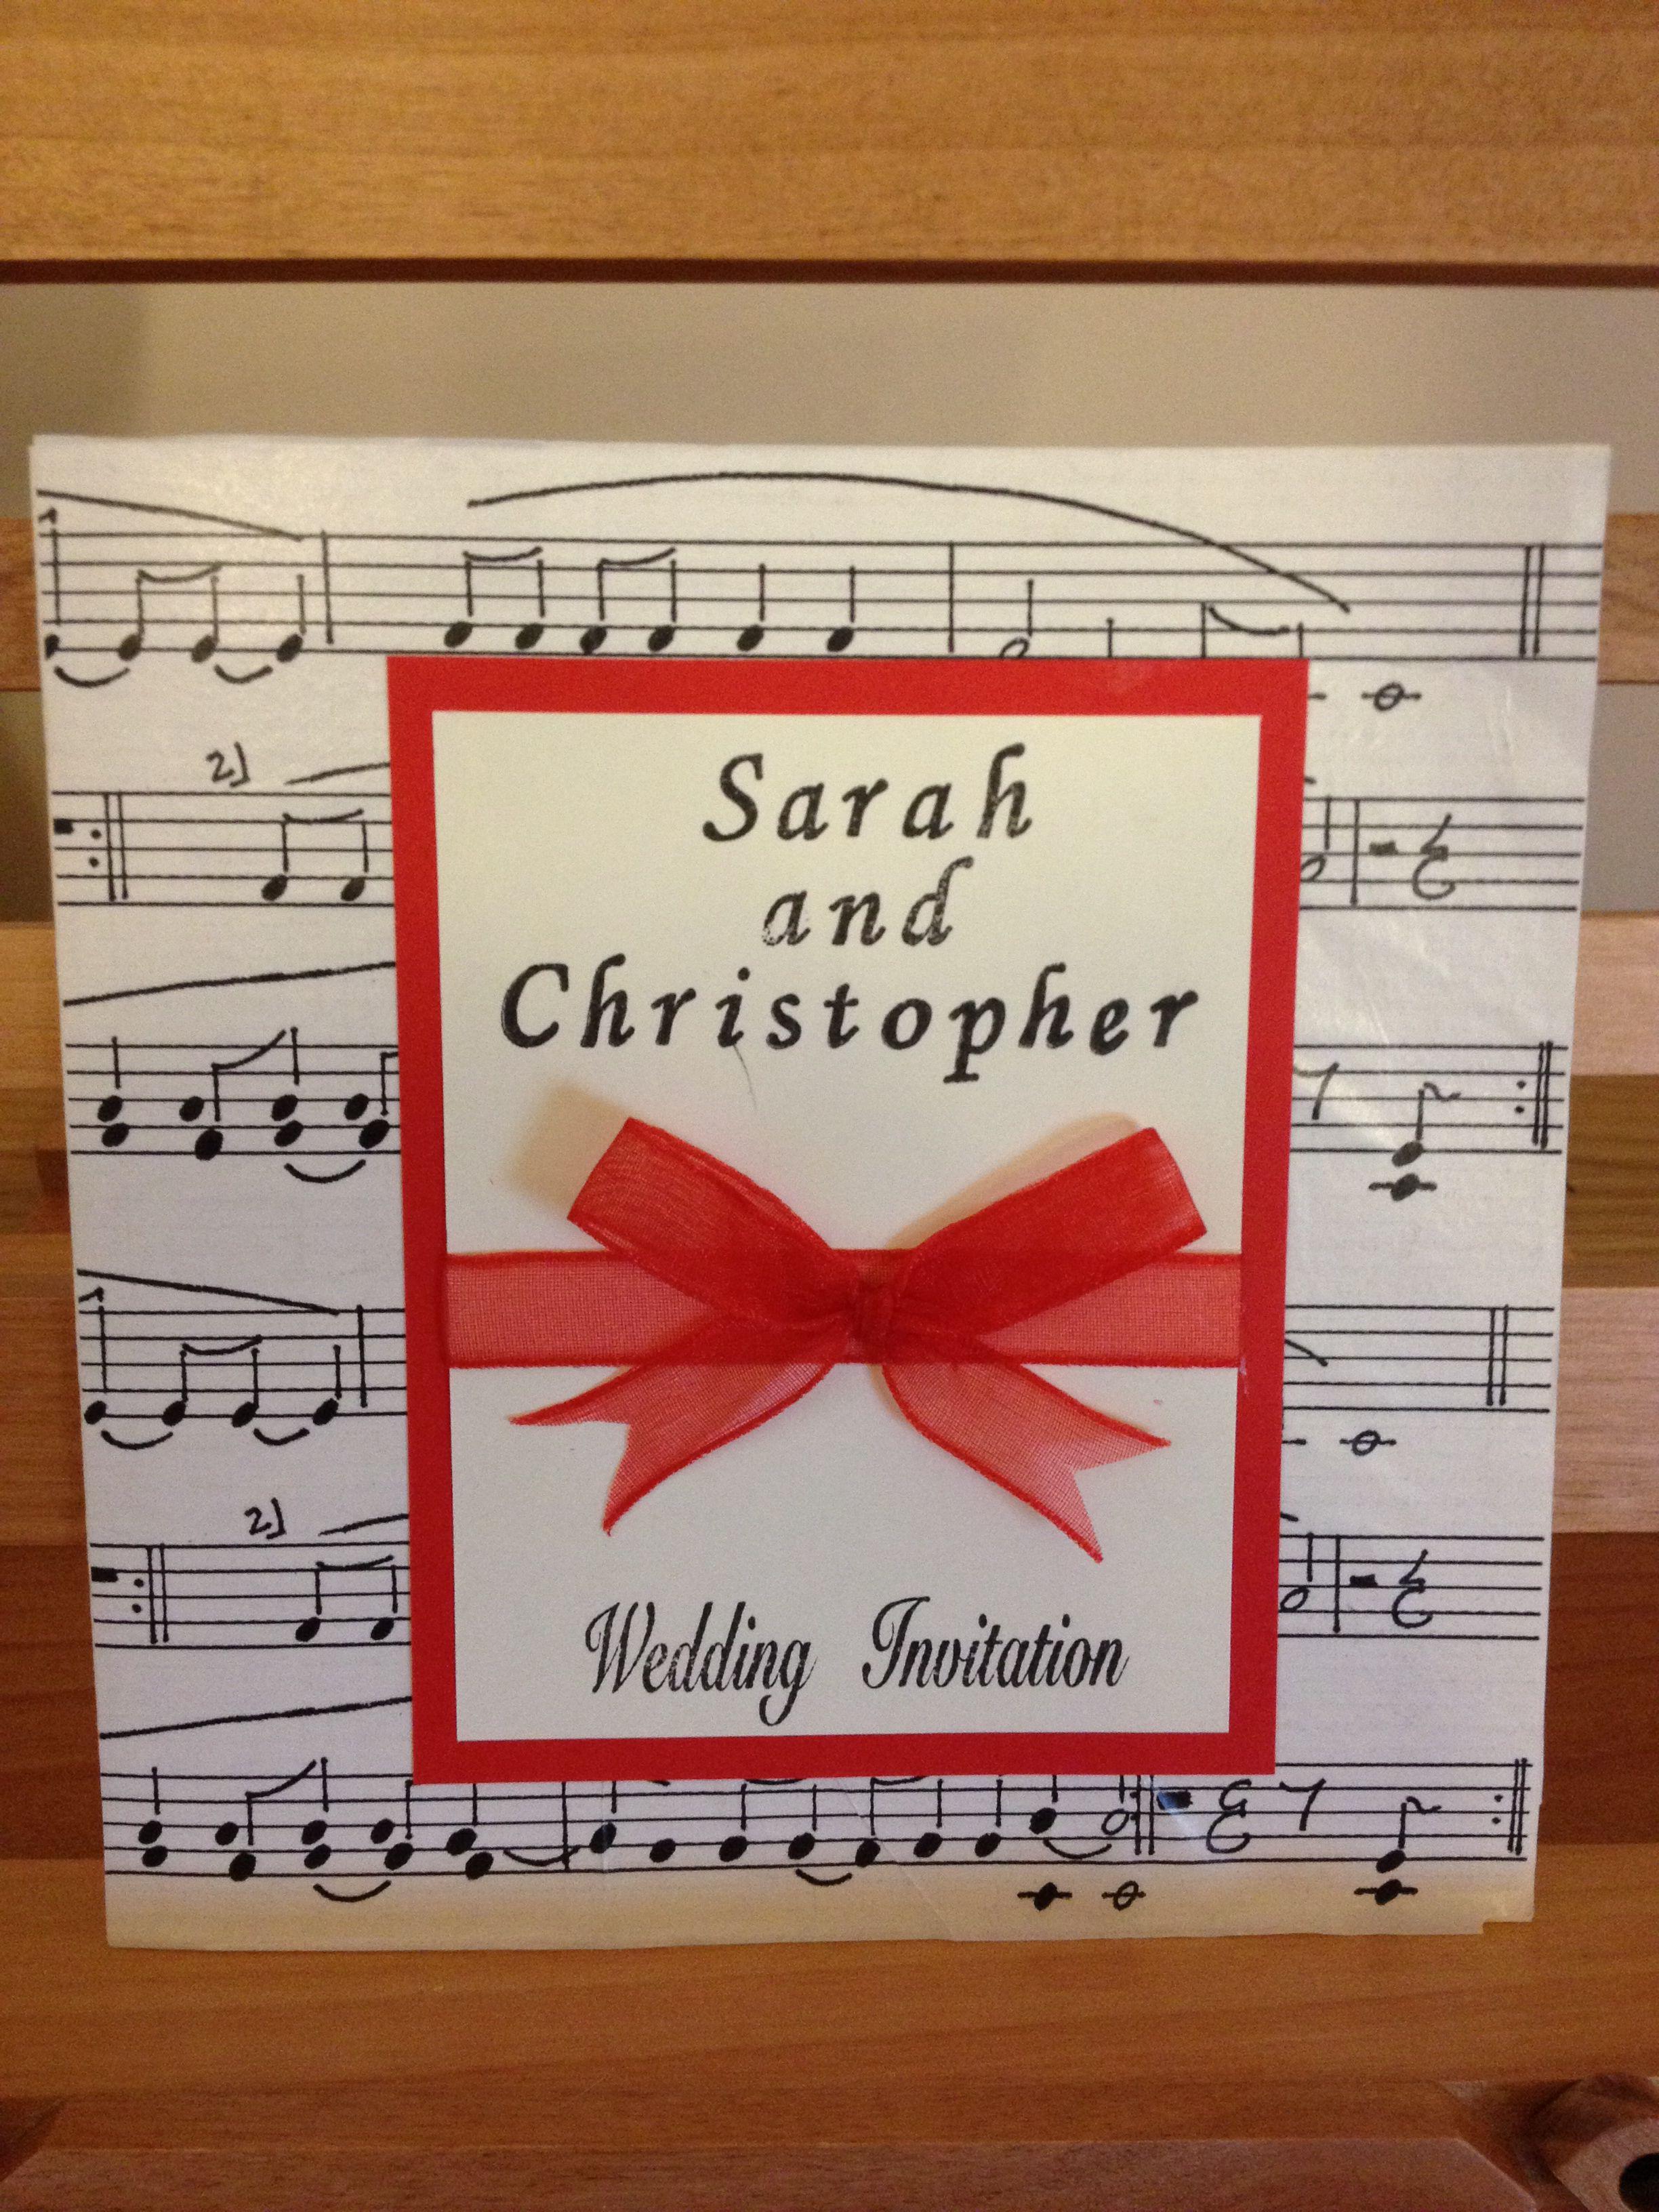 Amazing Wedding Invitation Music Theme Composition - Invitations and ...